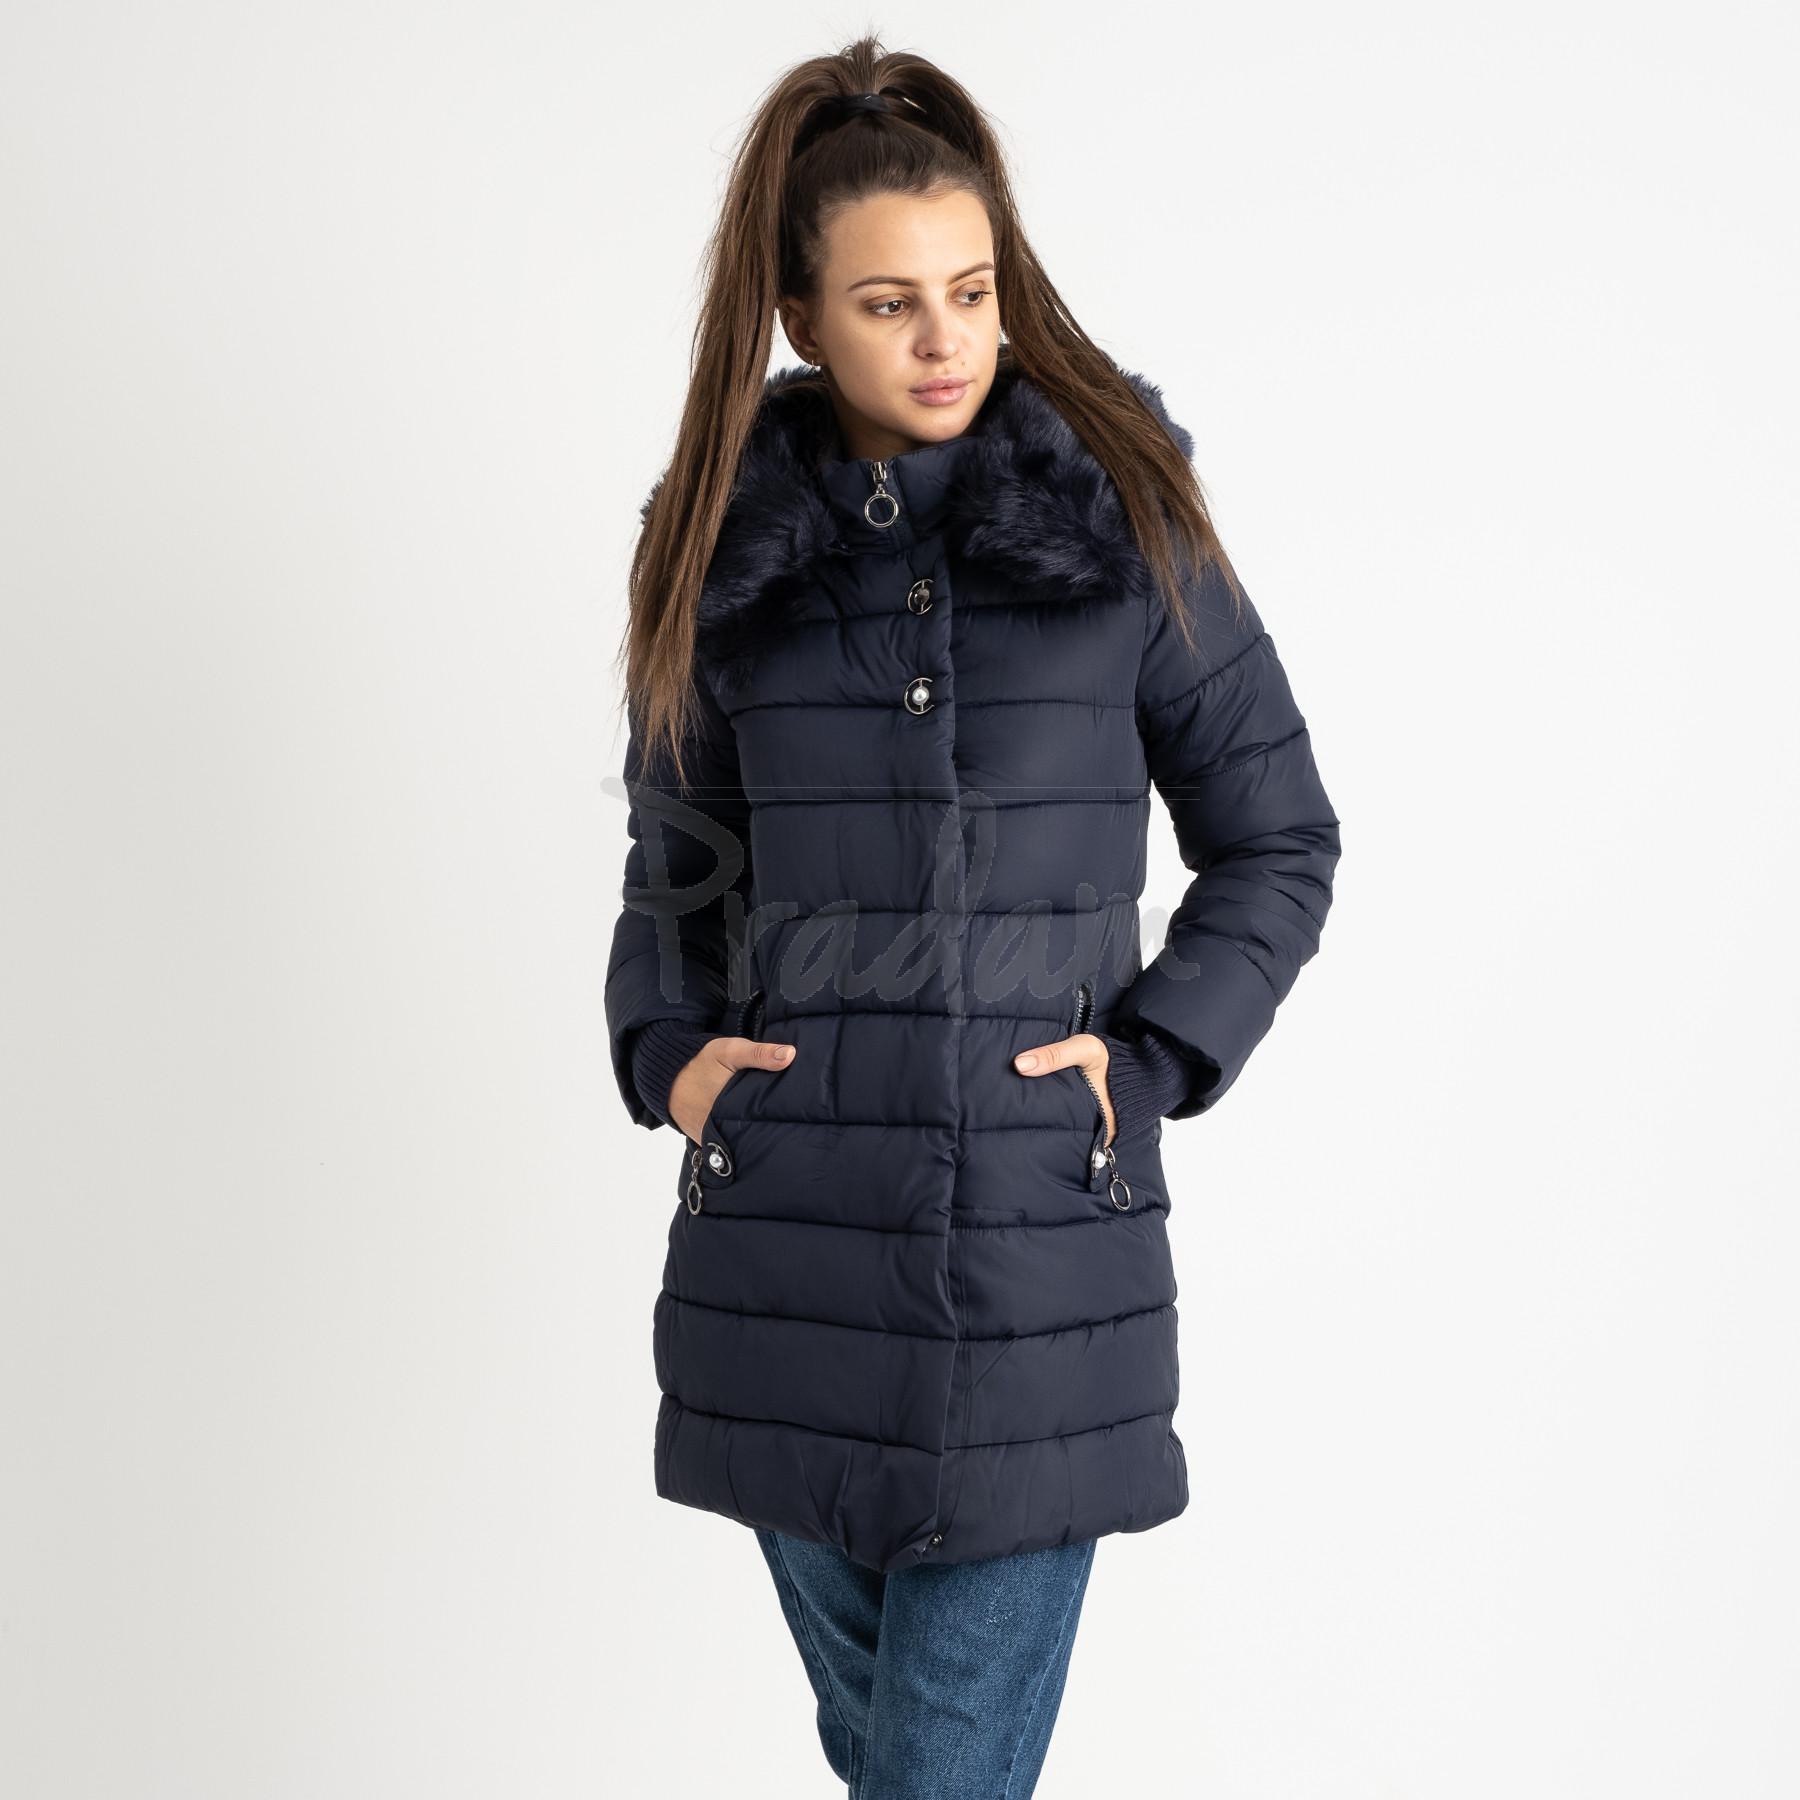 1089-1 синяя куртка женская на синтепоне (4 ед. размеры: M.L.XL.XXL)